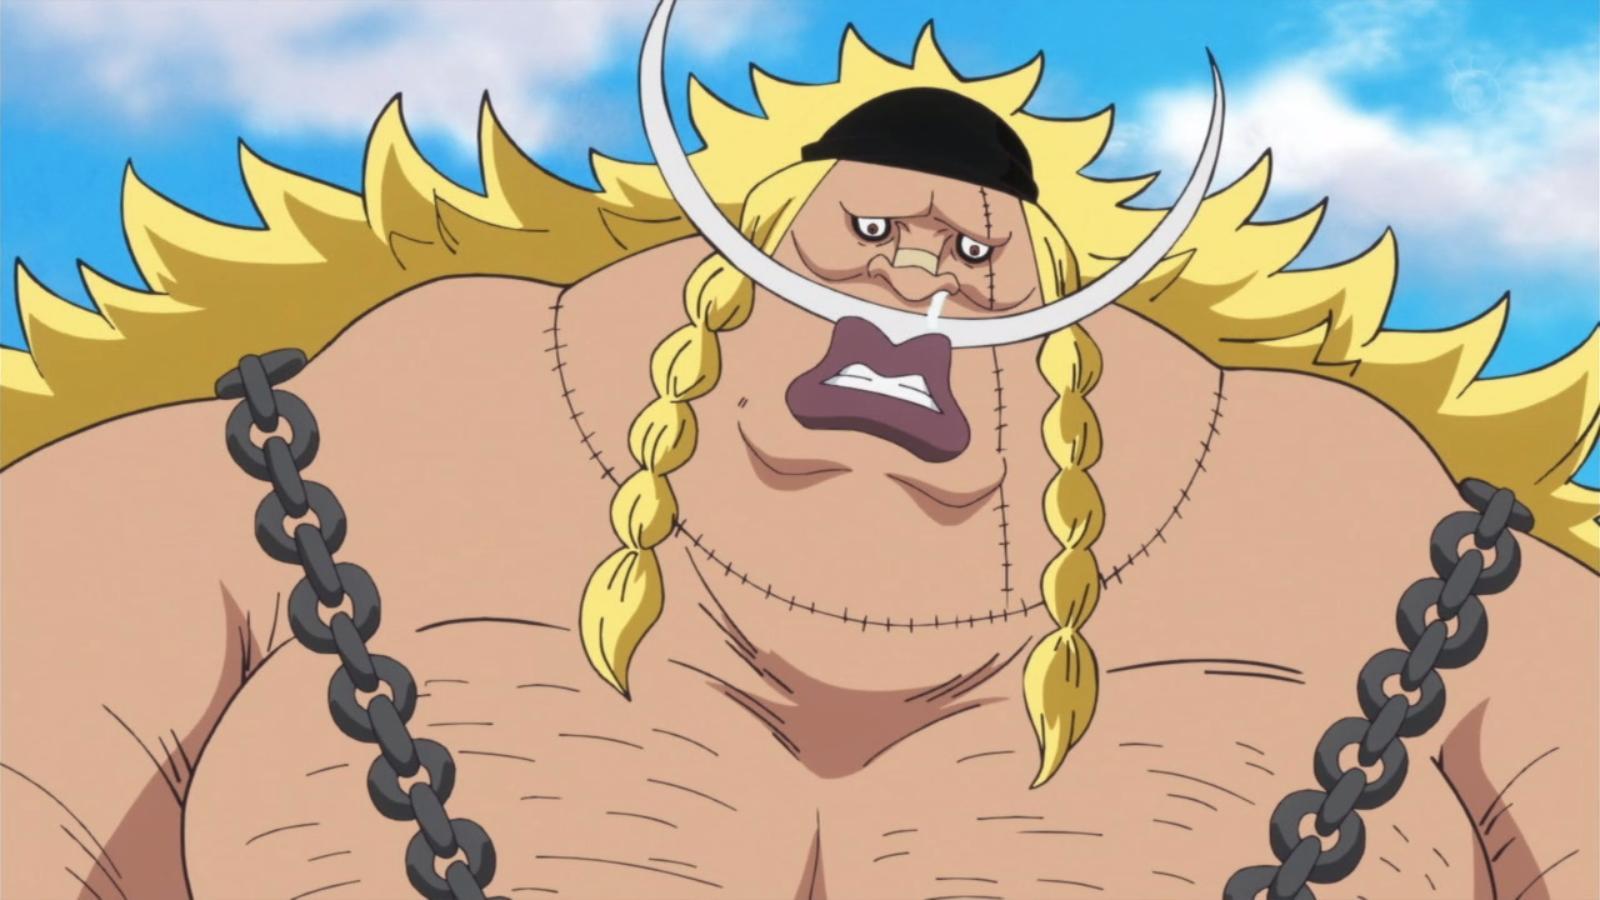 7 Karakter dalam One Piece yang Paling Misterius 6